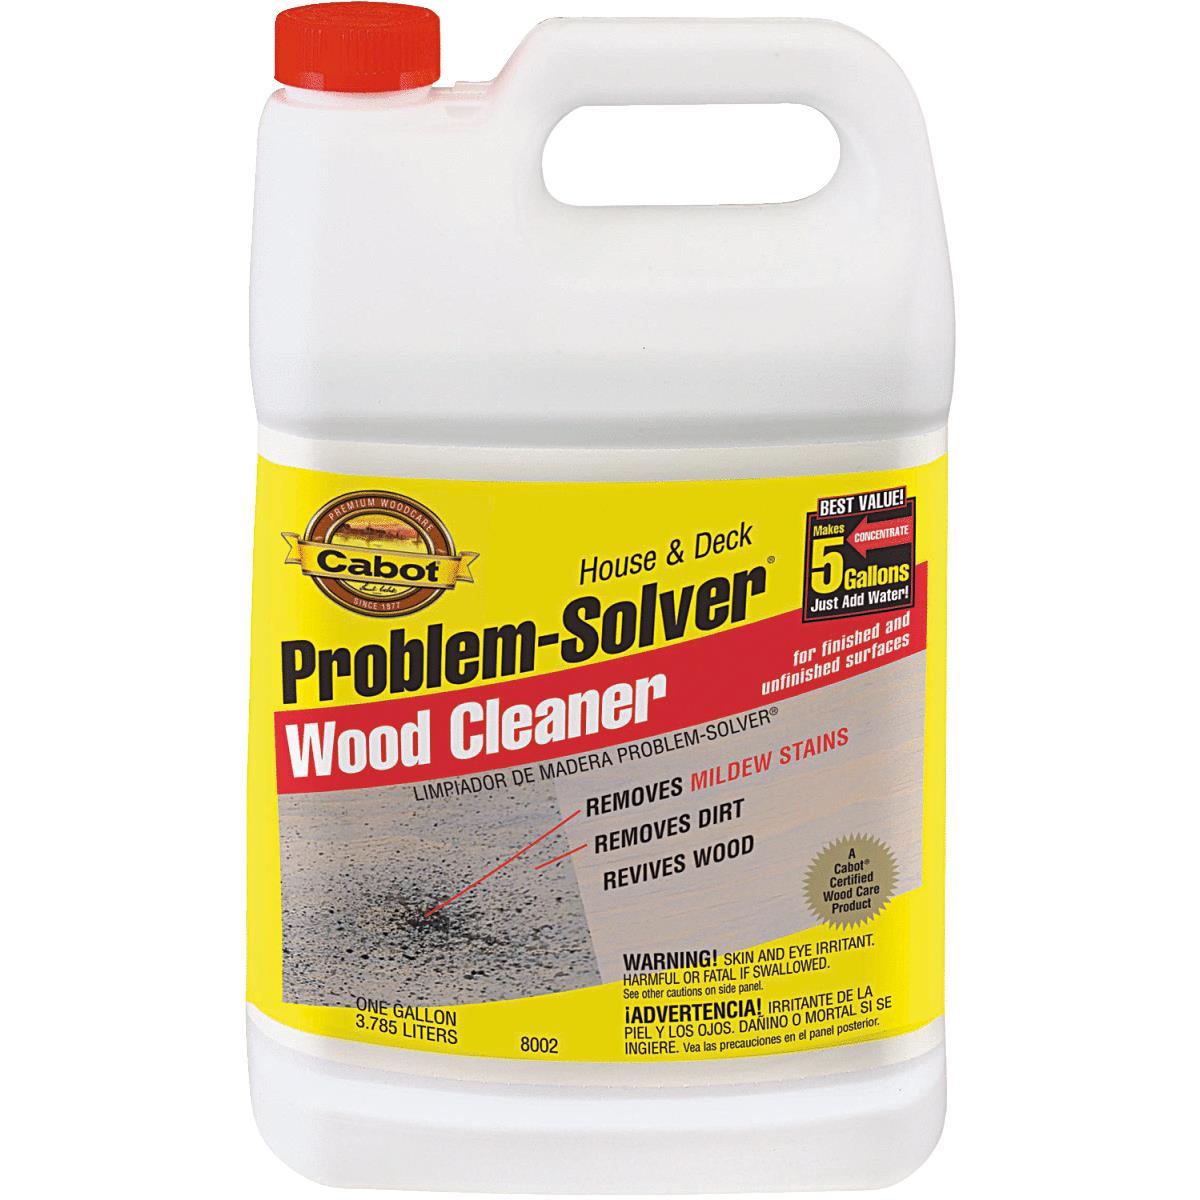 Cabot Problem-Solver House & Deck Wood Cleaner